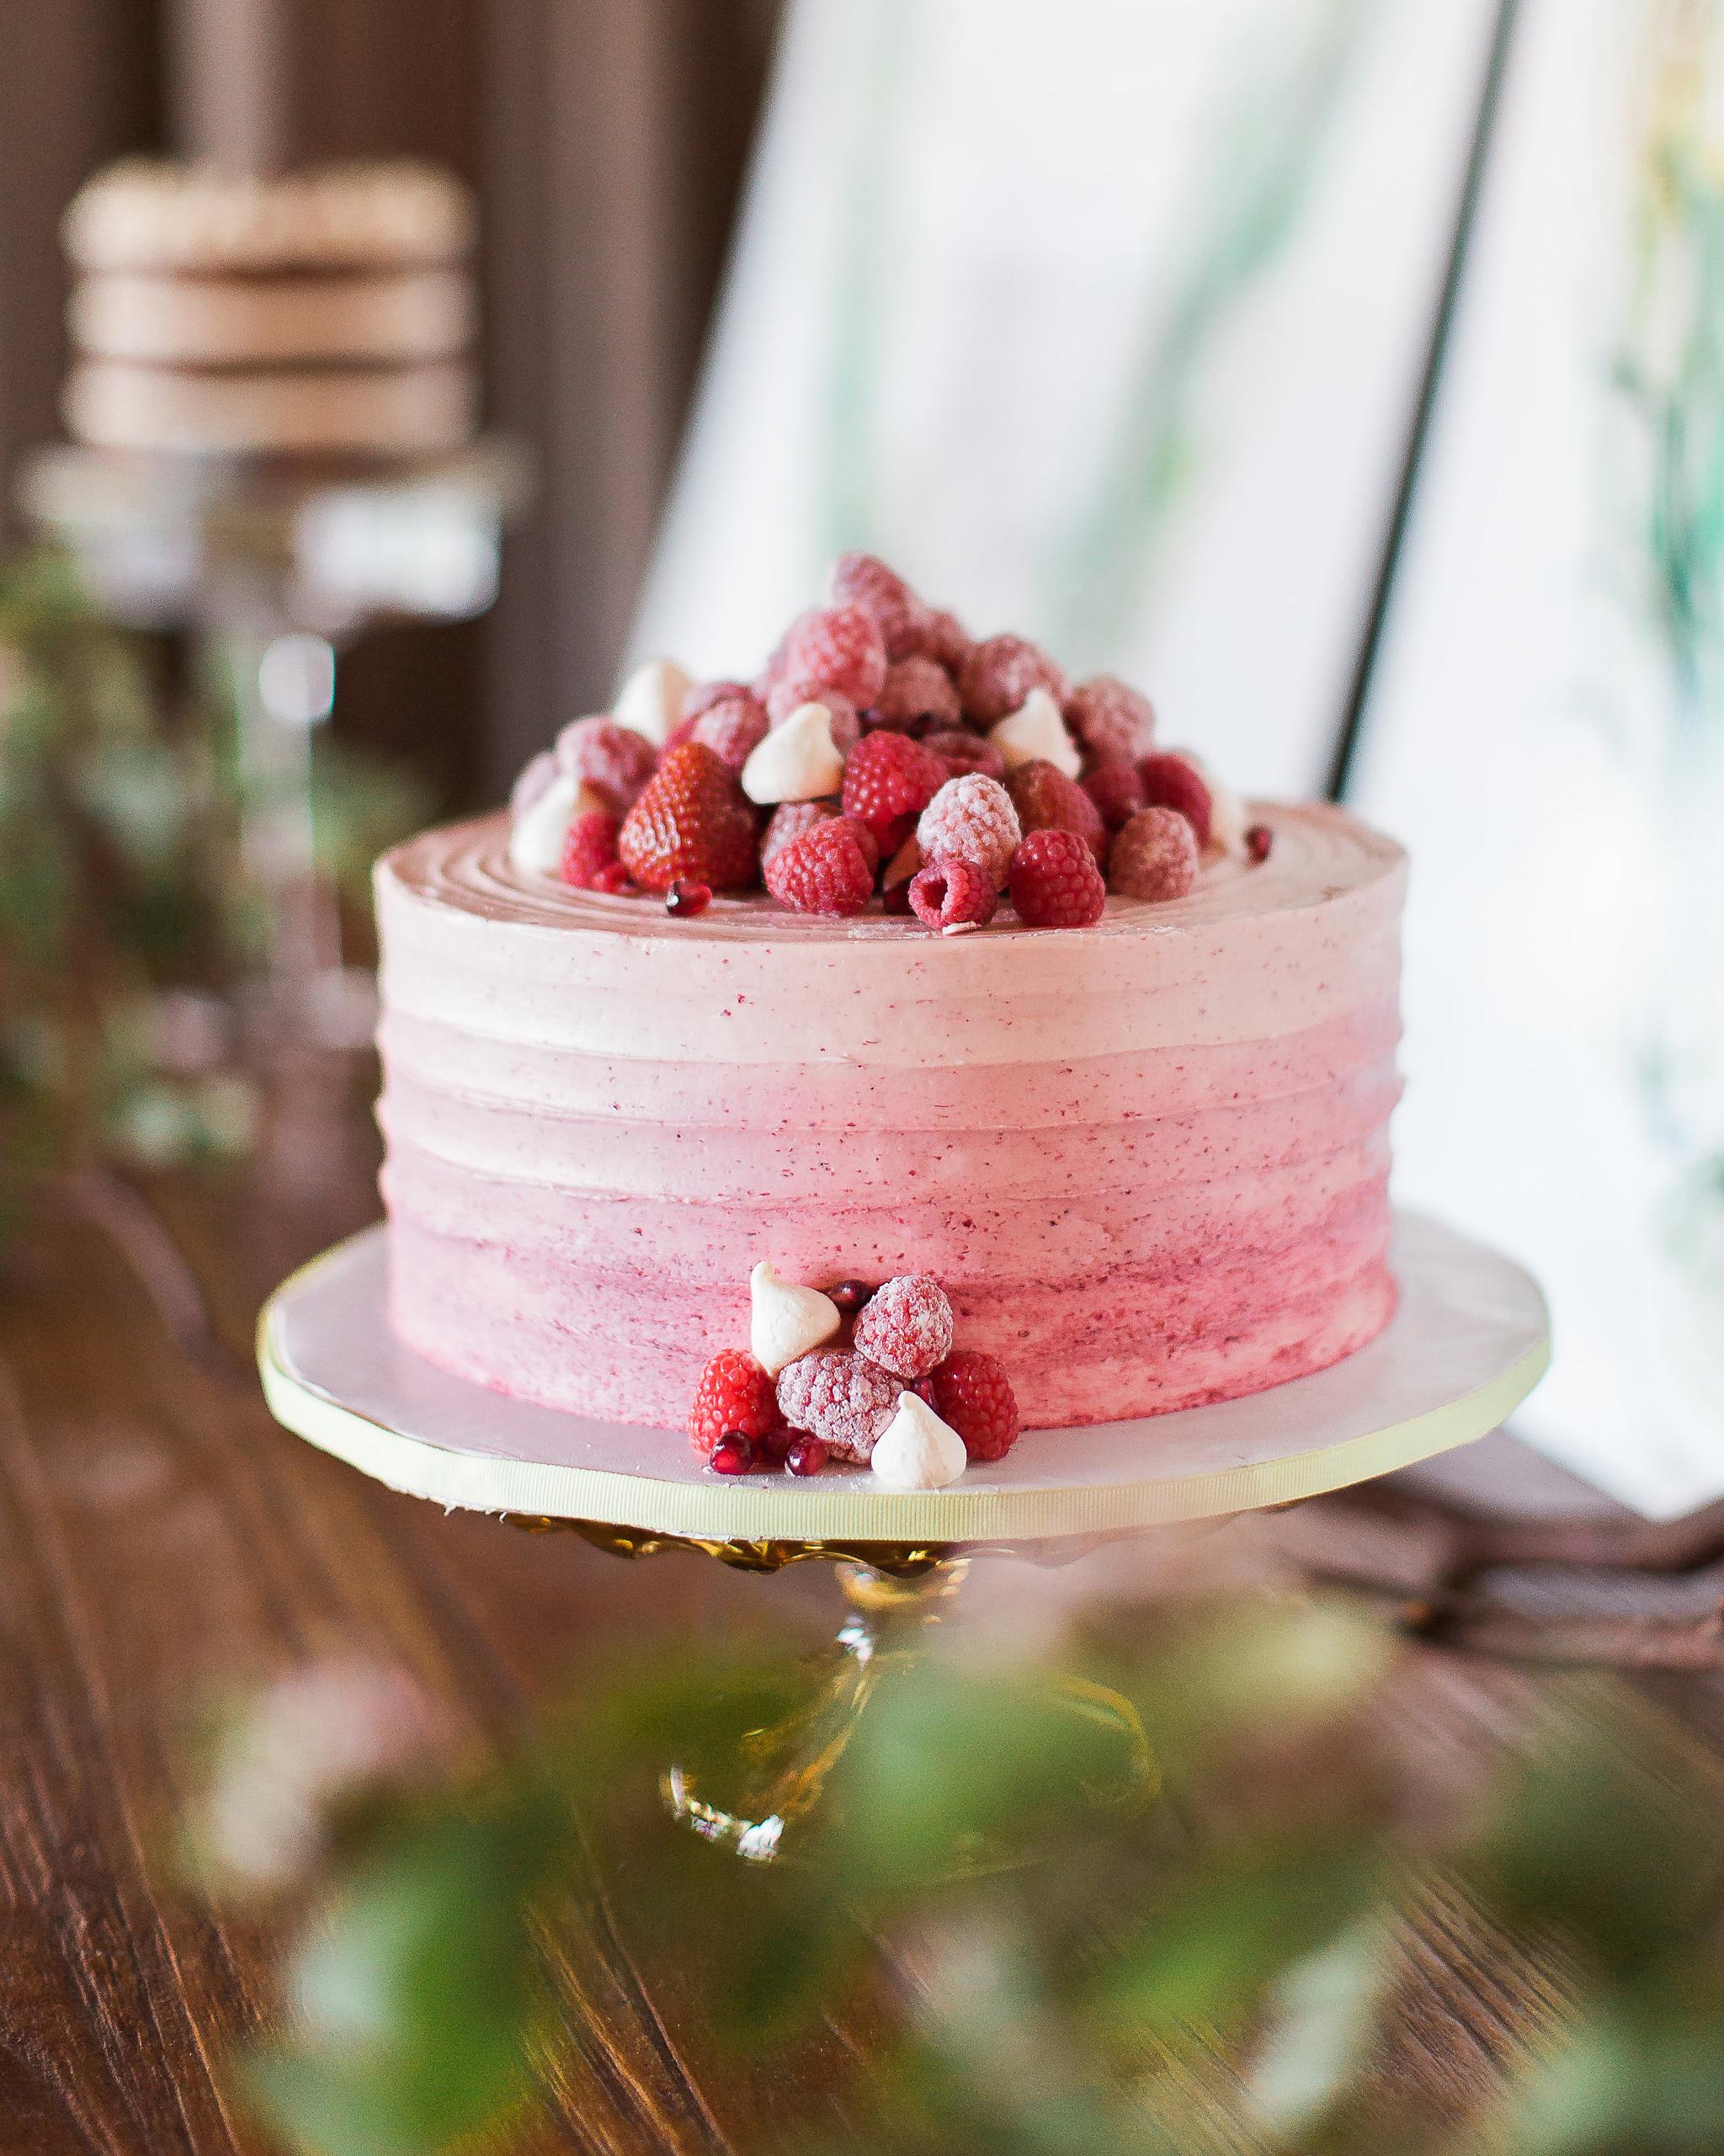 creative-cake-flavors-chocolate-cake-with-fresh-raspberry-0116-buttercream.jpg